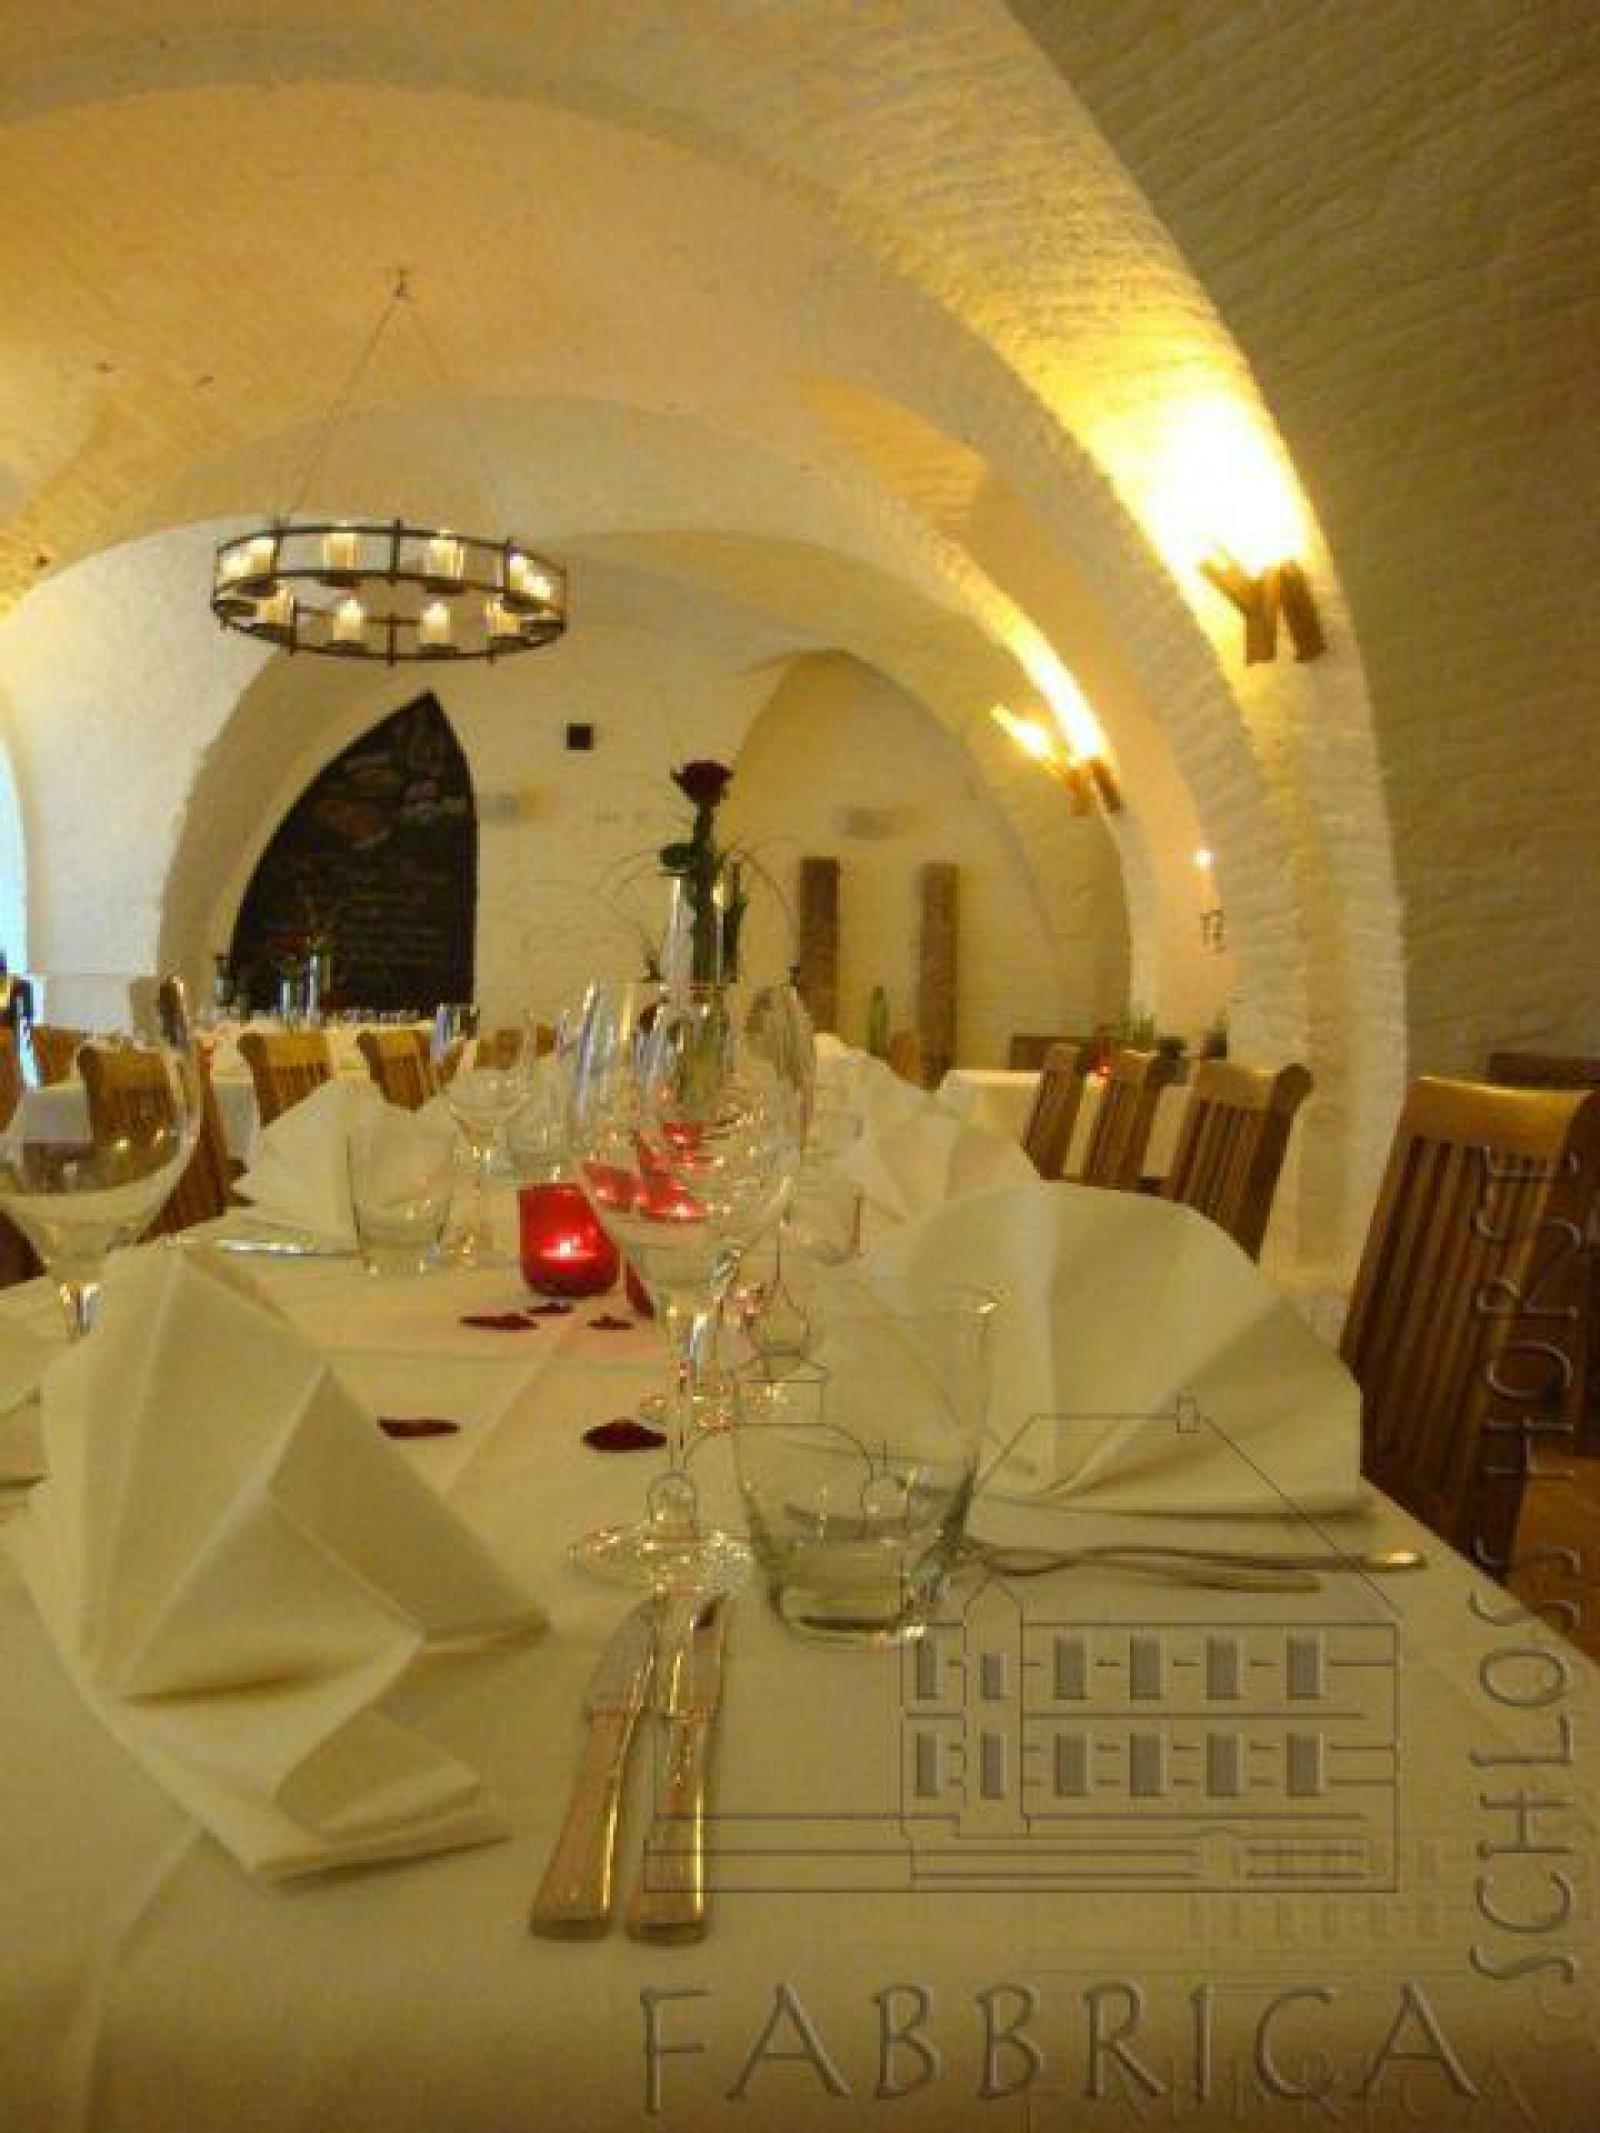 Restaurant Fabbrica Italiana In Hattingen